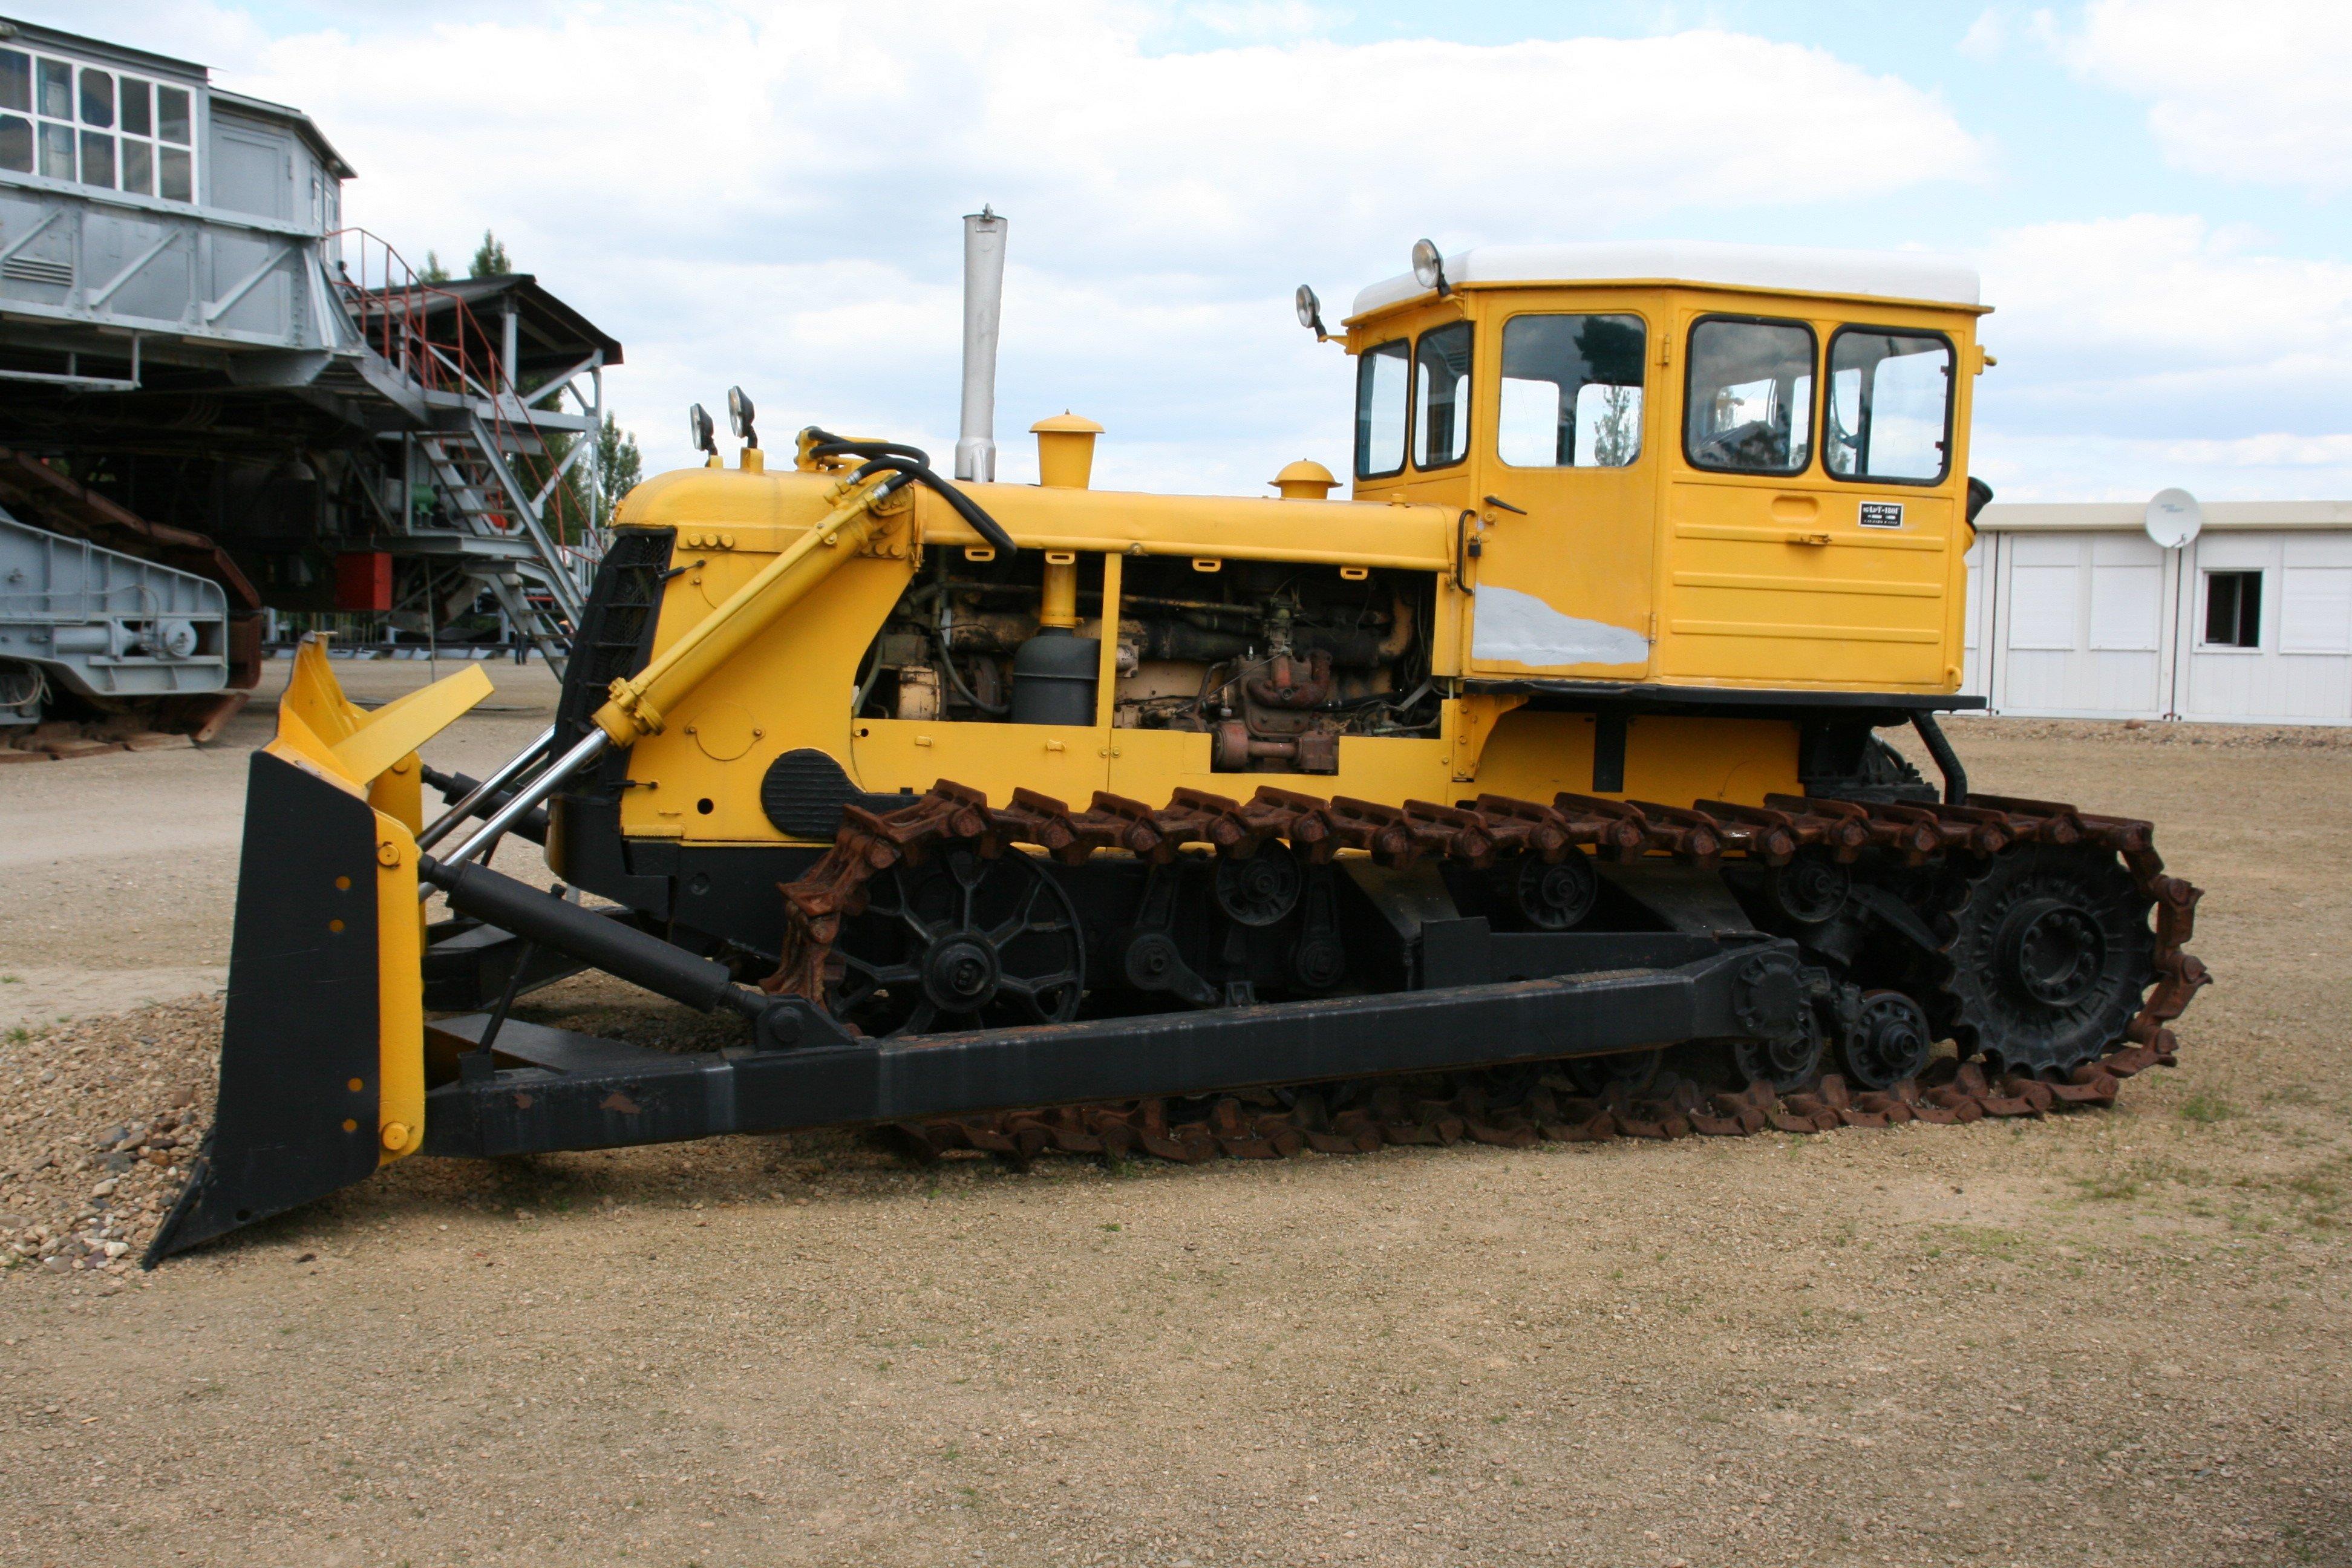 схема включения скорастей на тракторе т150